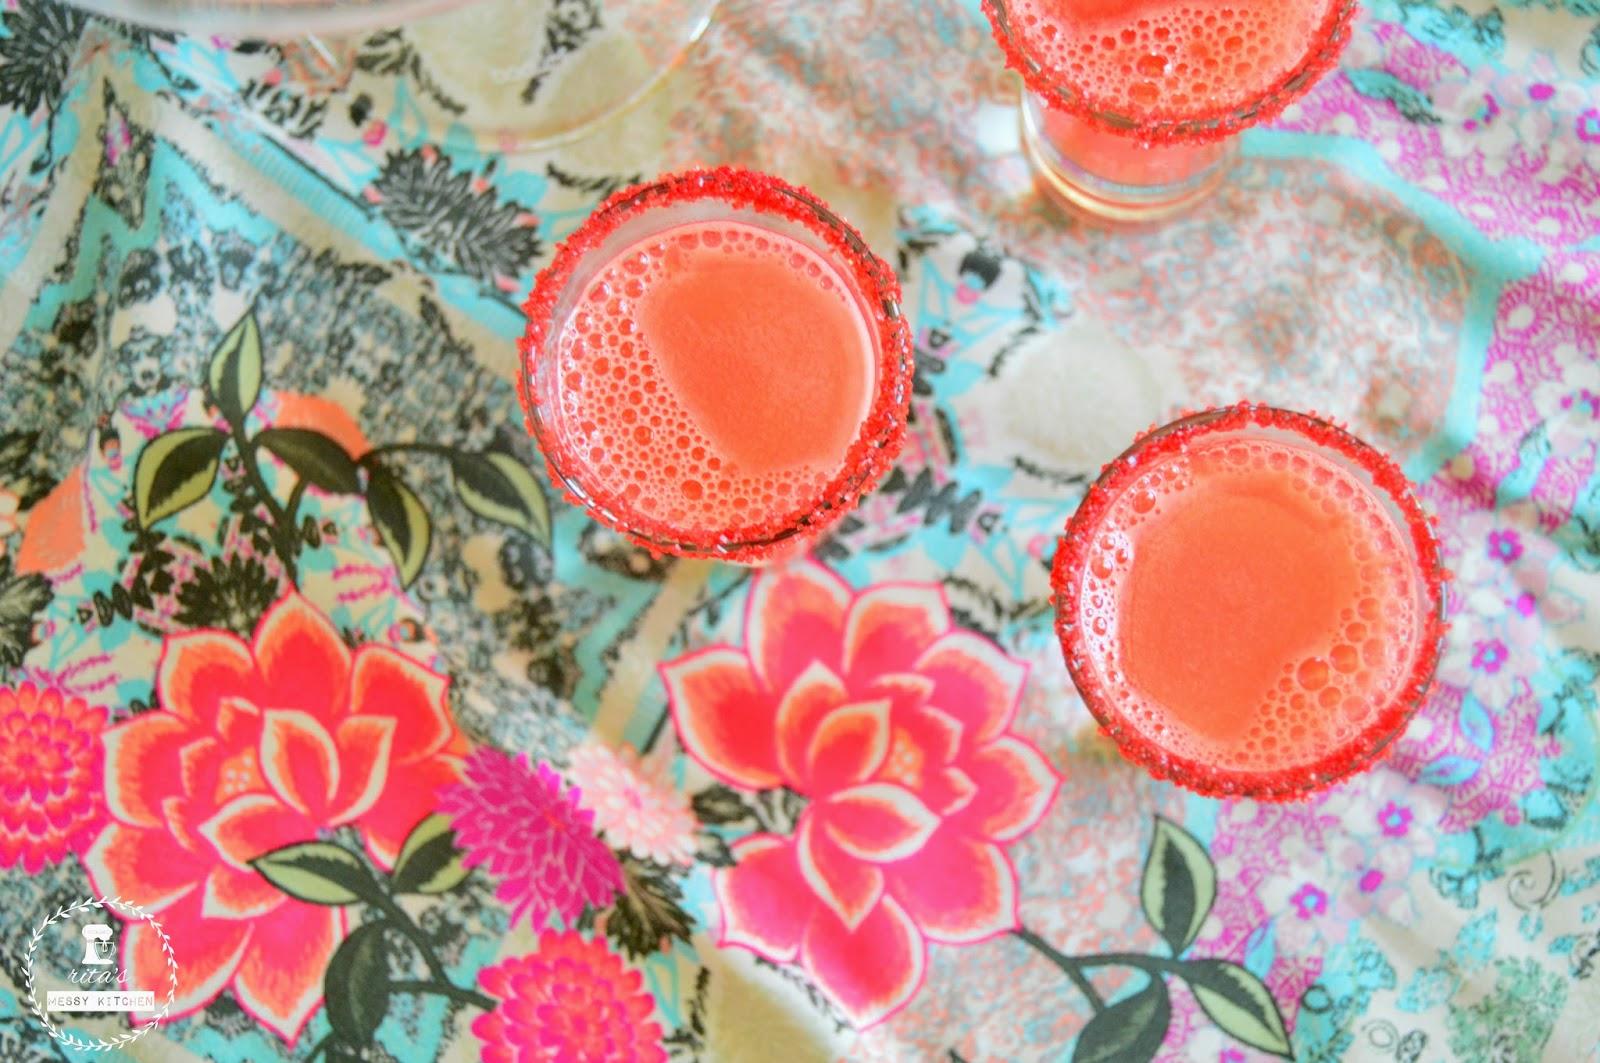 Margaritas de Melancia by Rita's Messy Kitchen